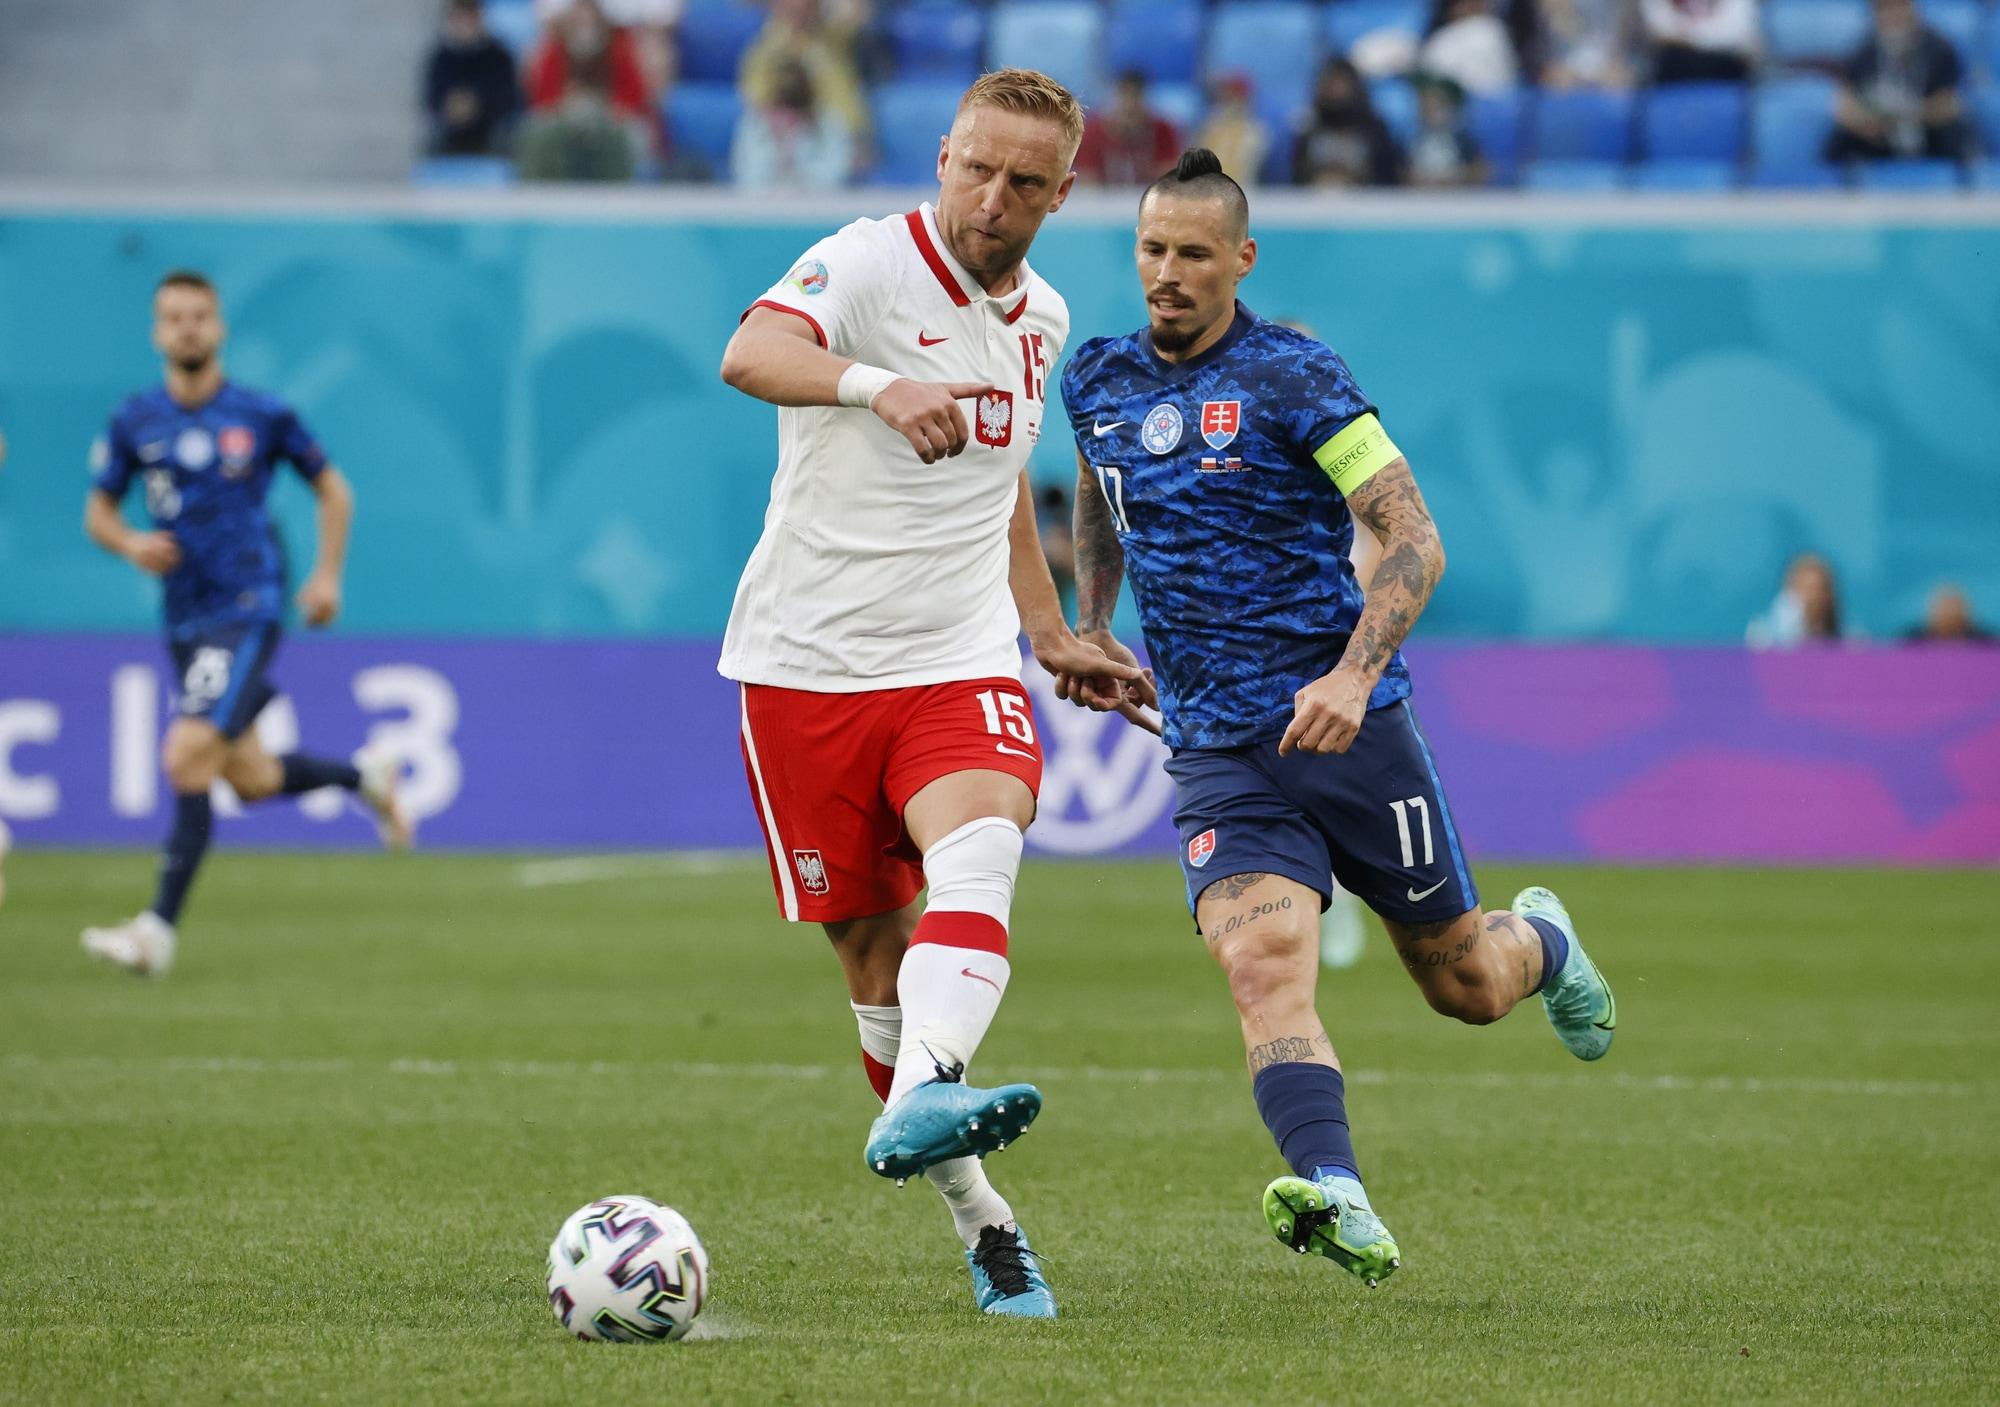 Polonia ko con la Slovacchia di Hamsik: decide Skriniar